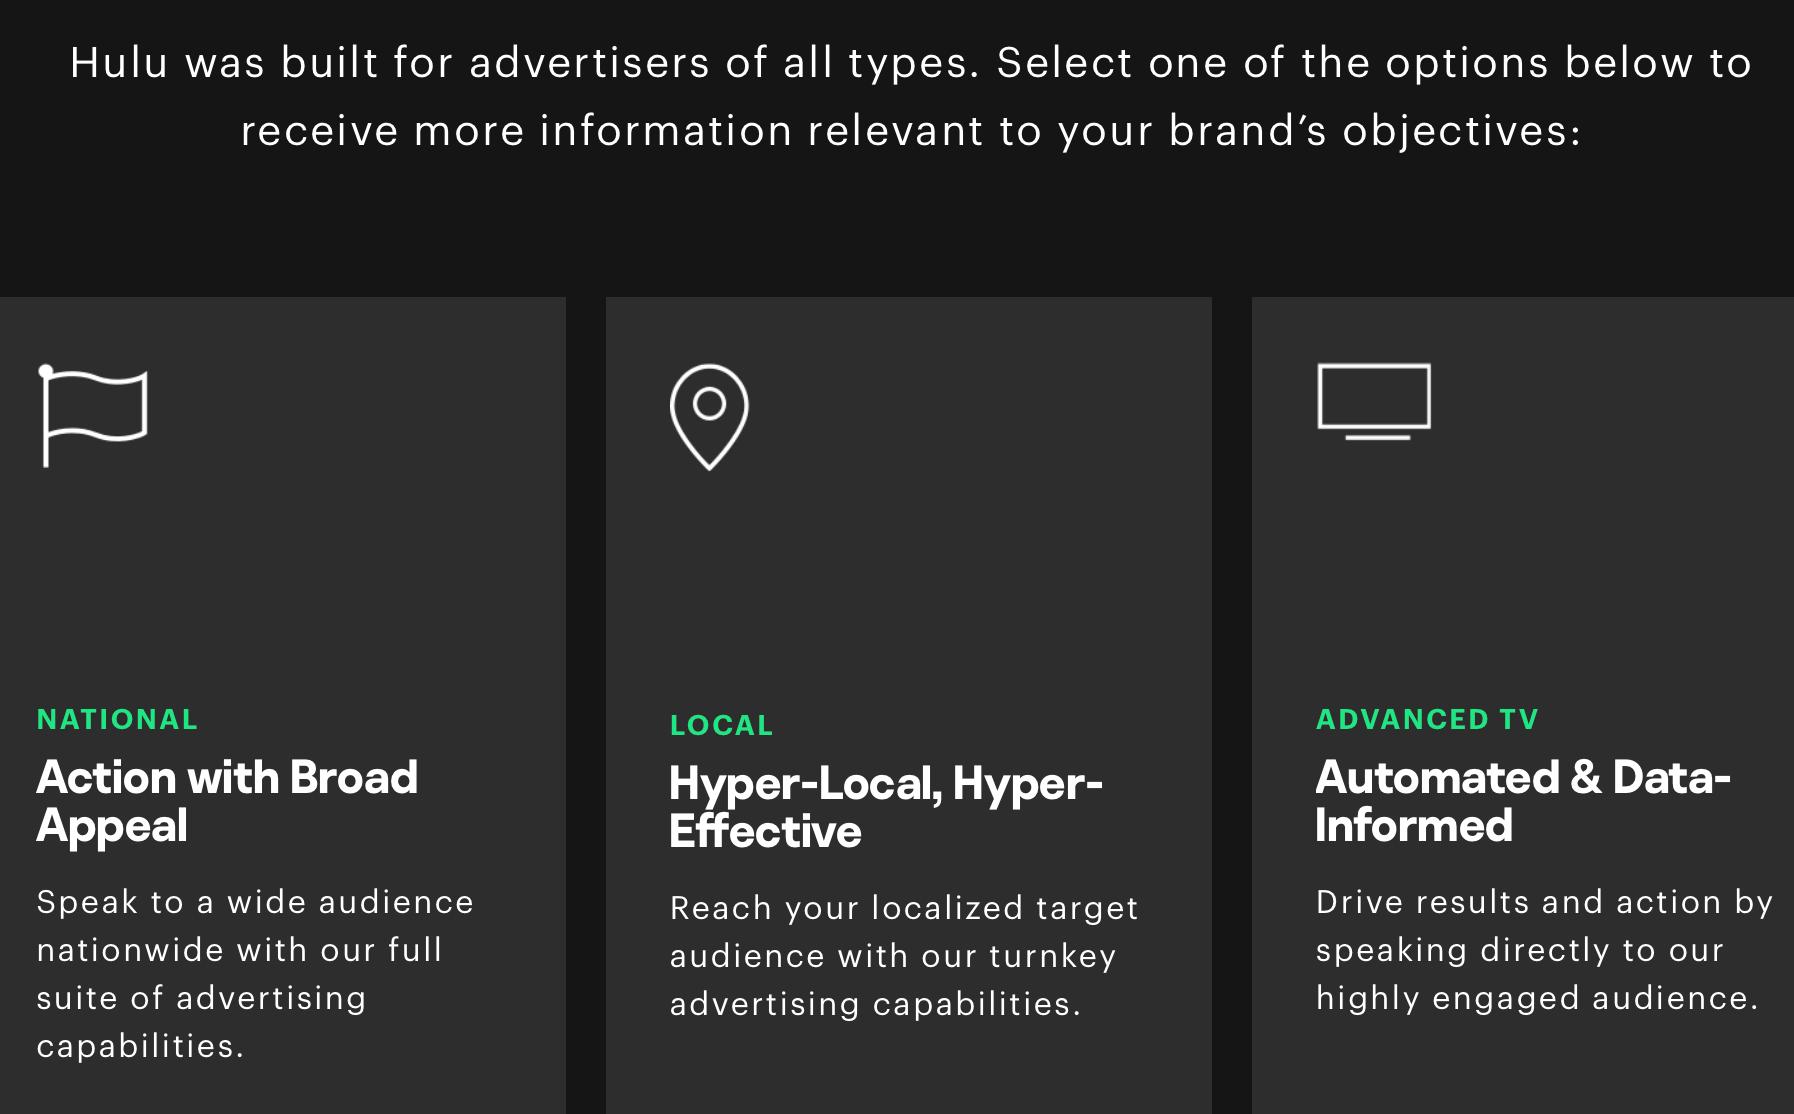 Hulu's self-service ad platform